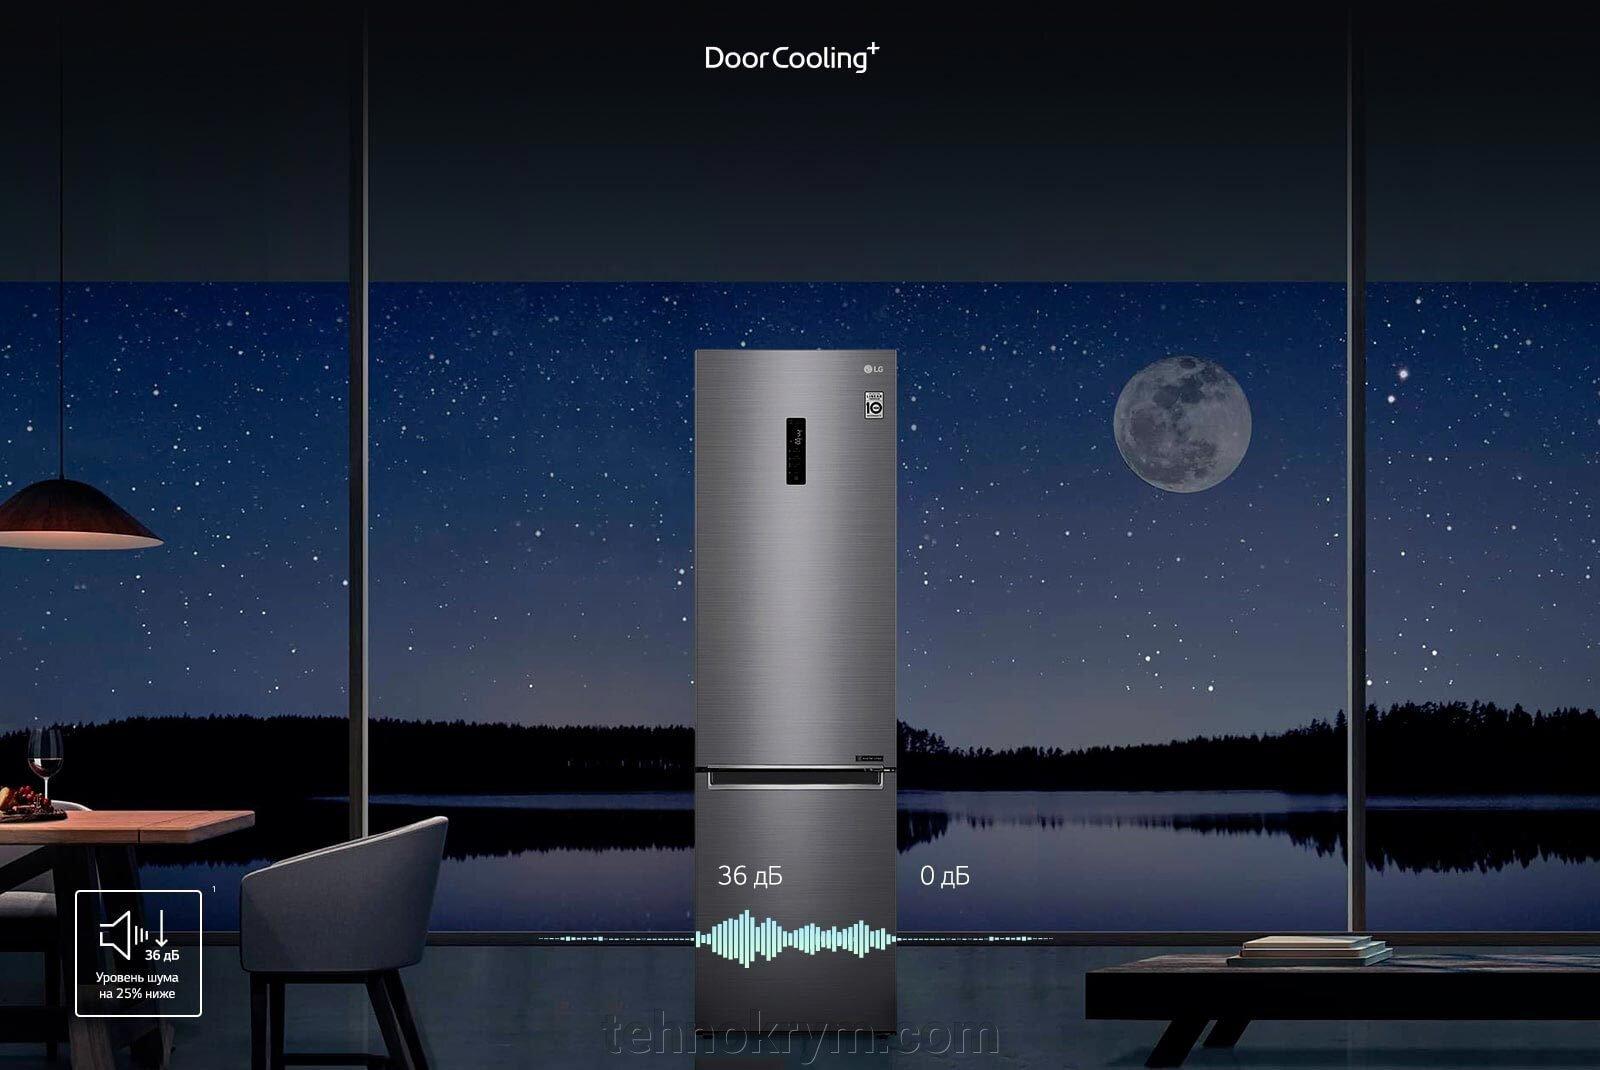 Двухкамерный холодильник LG GA-B509CETL с технологией DoorCooling+, бежевый - фото pic_b6e0fbac784eed2e6ef3d45300f8154b_1920x9000_1.jpg